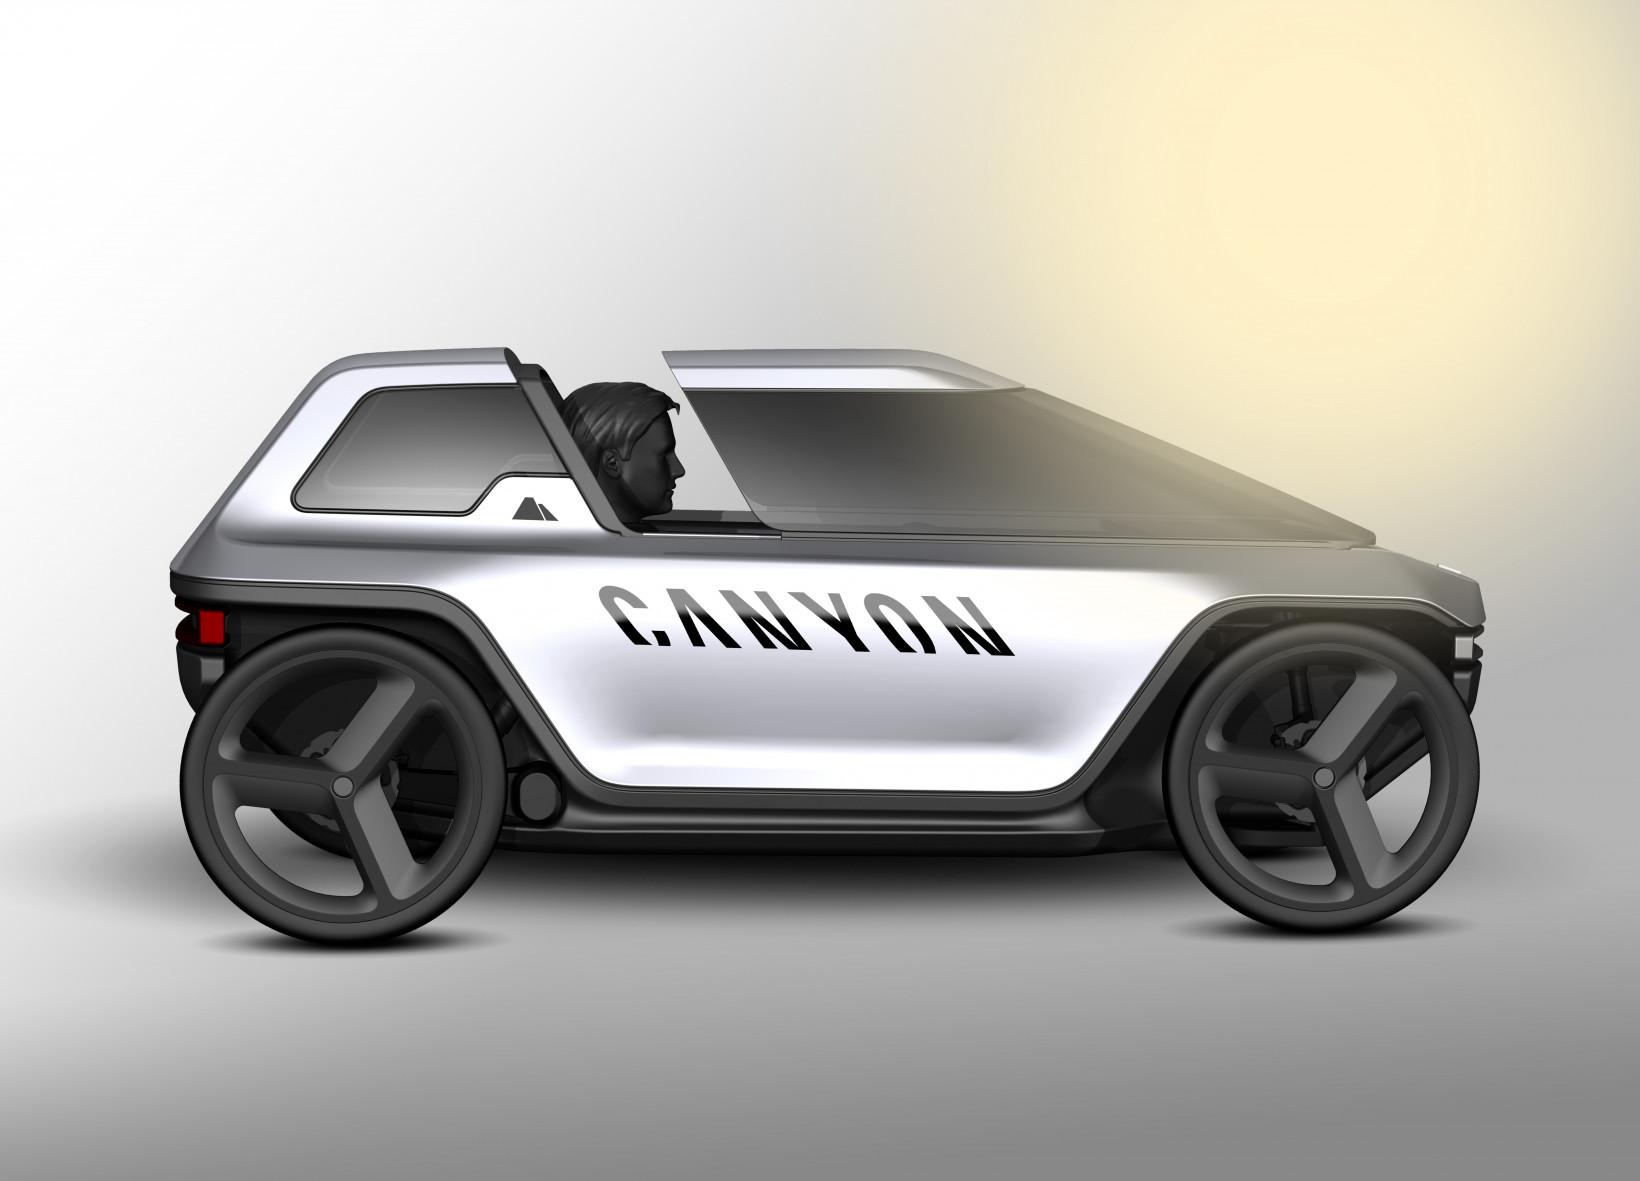 canyon, podbike, car, ev, future